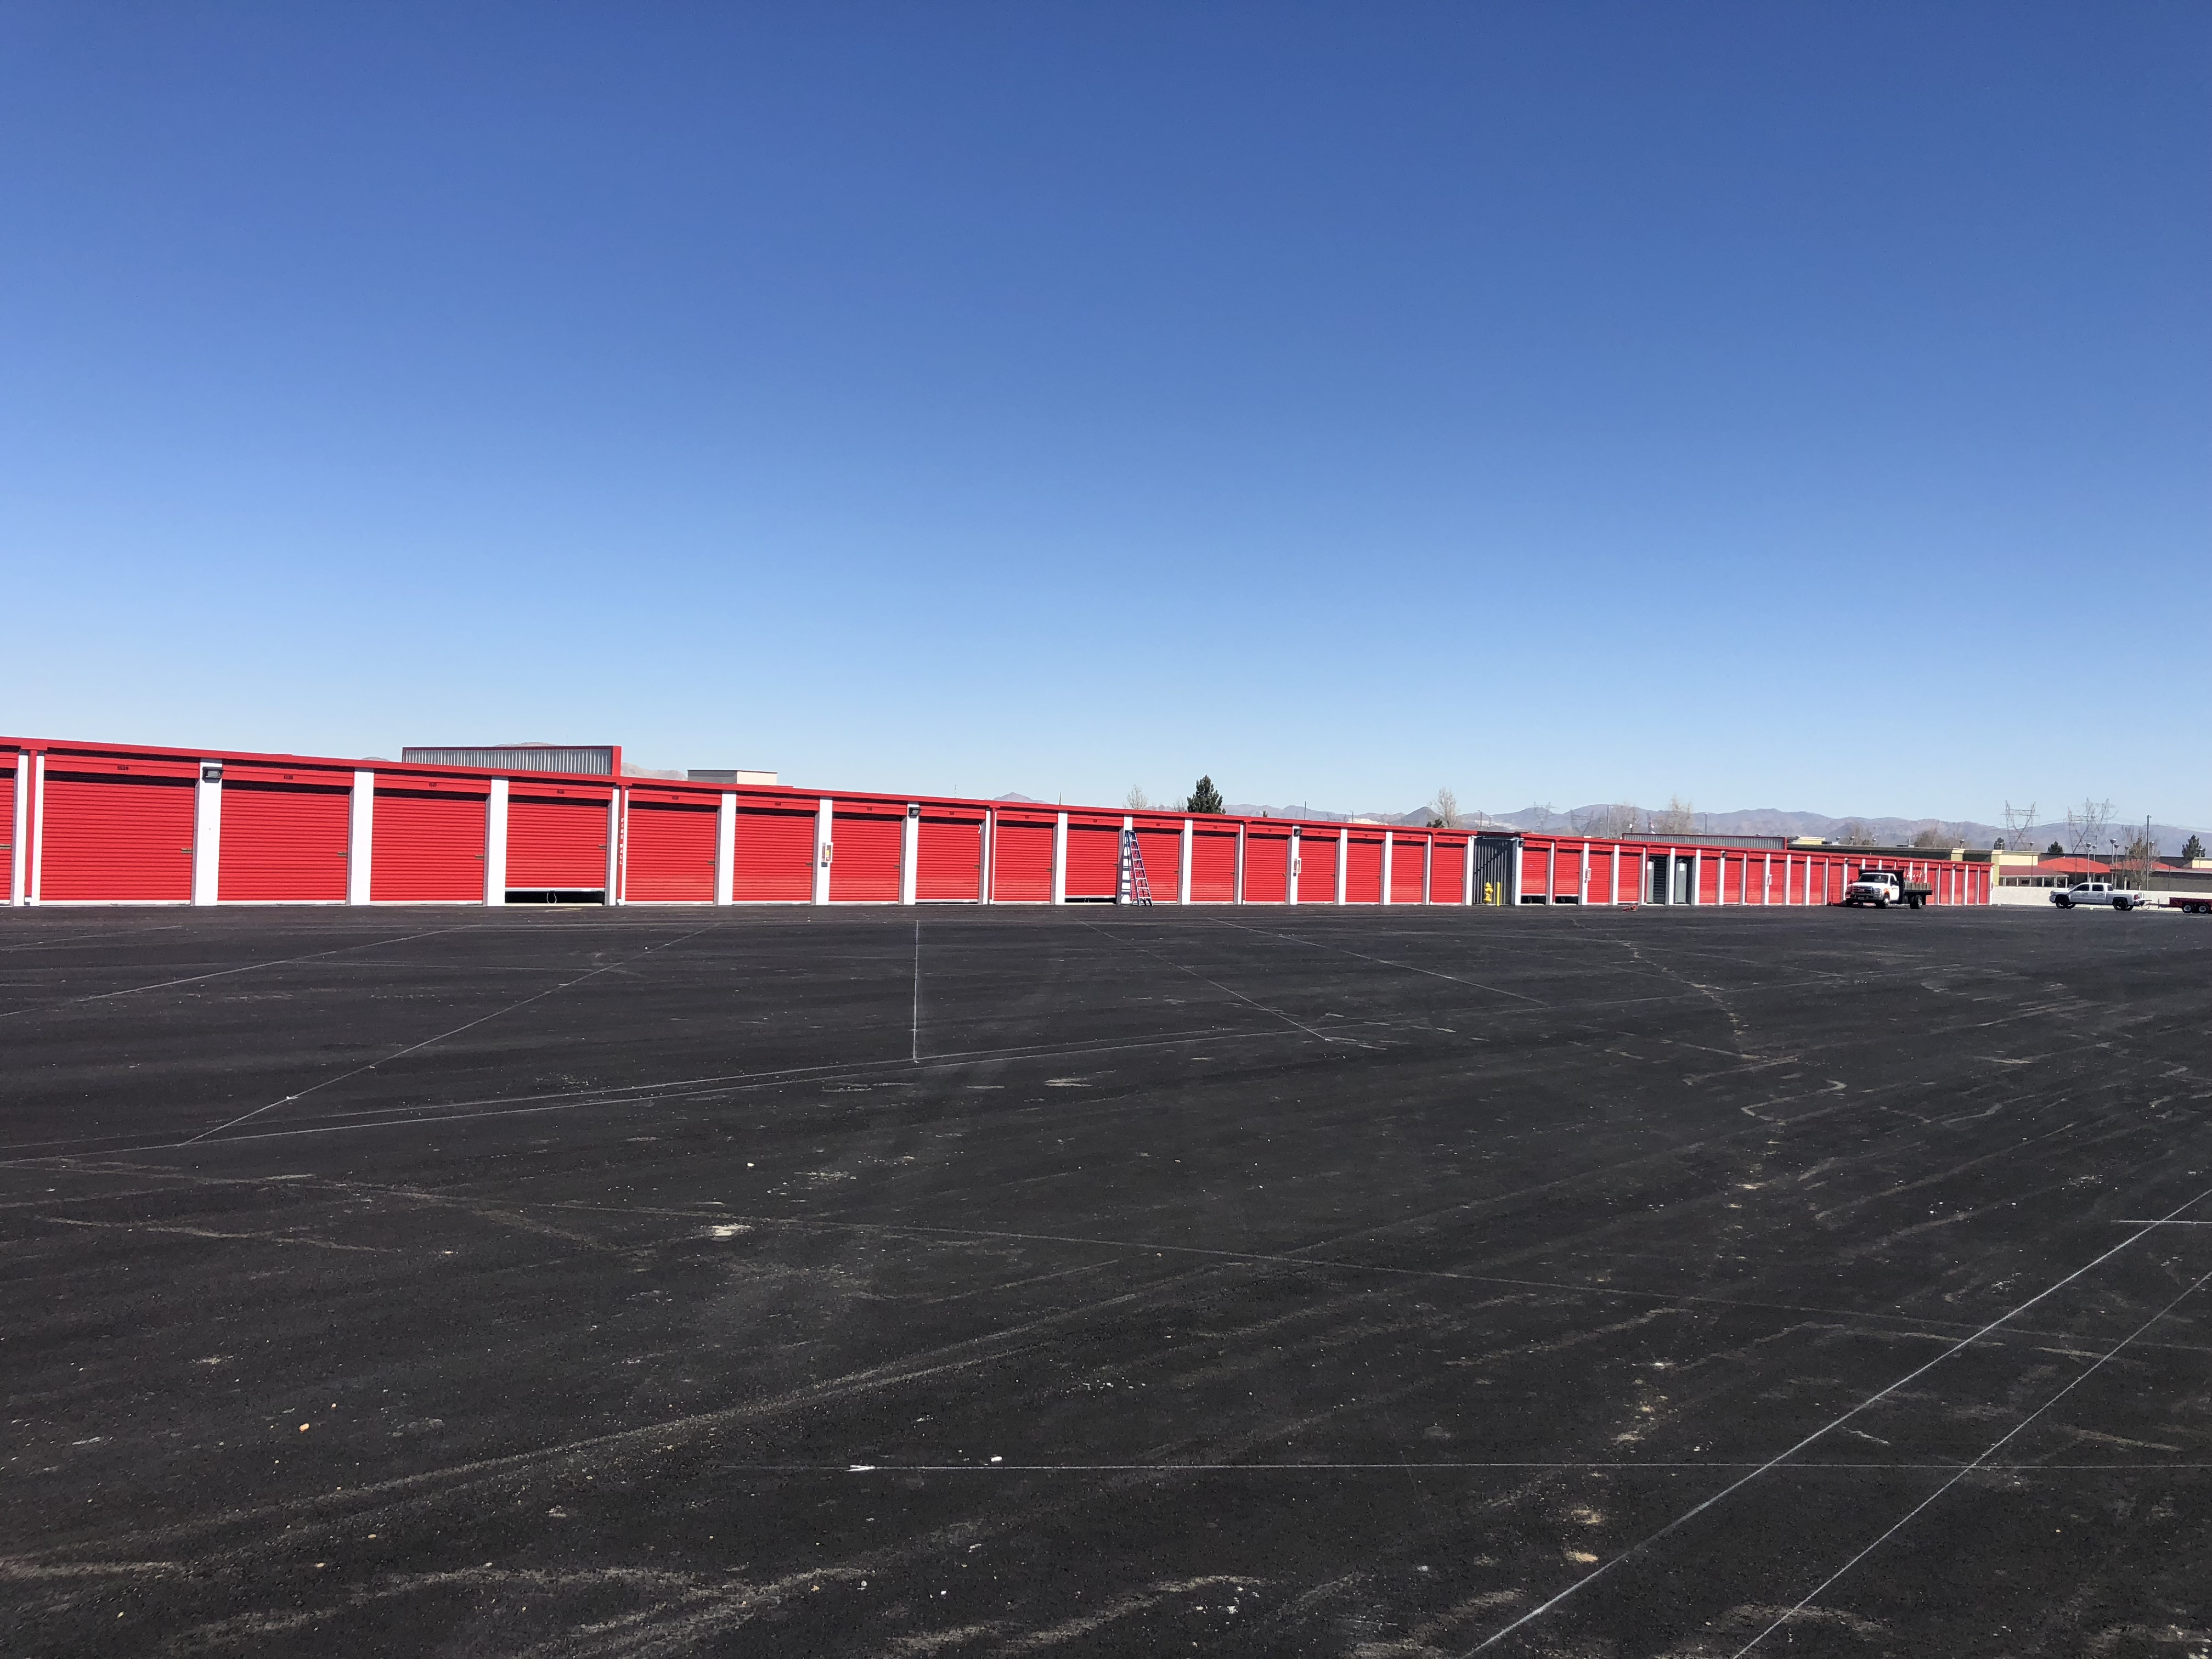 Storage Units In Visalia Ca Dandk Organizer